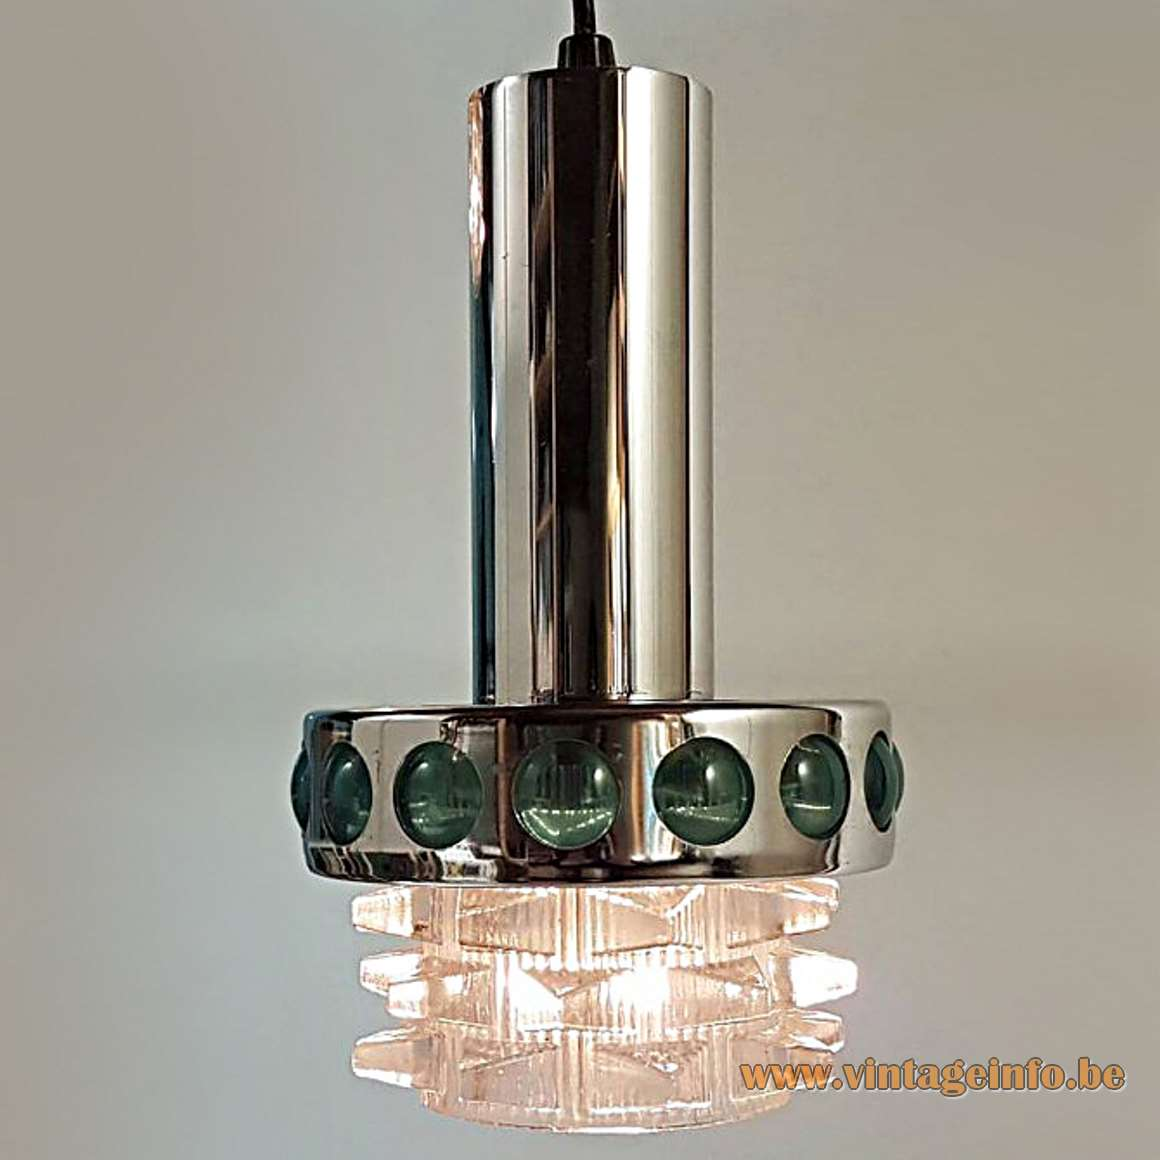 Massive Lighting Pendant Lamp - Green version